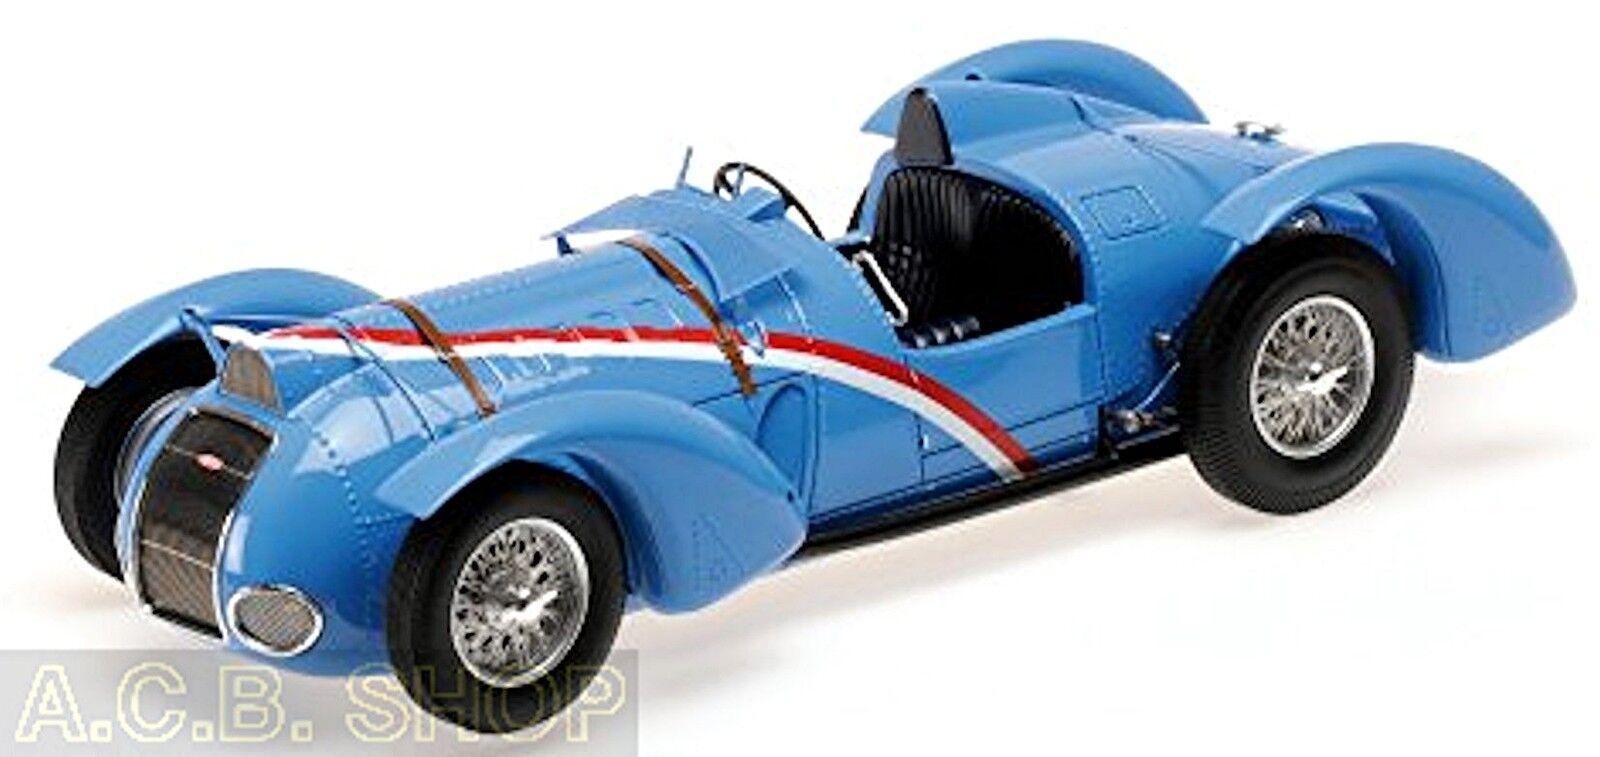 Delahaye type 145 v-12 grand prix 1937 Bleu bleu 1  18 Minichamps Mullin Ed. 7  vente pas cher